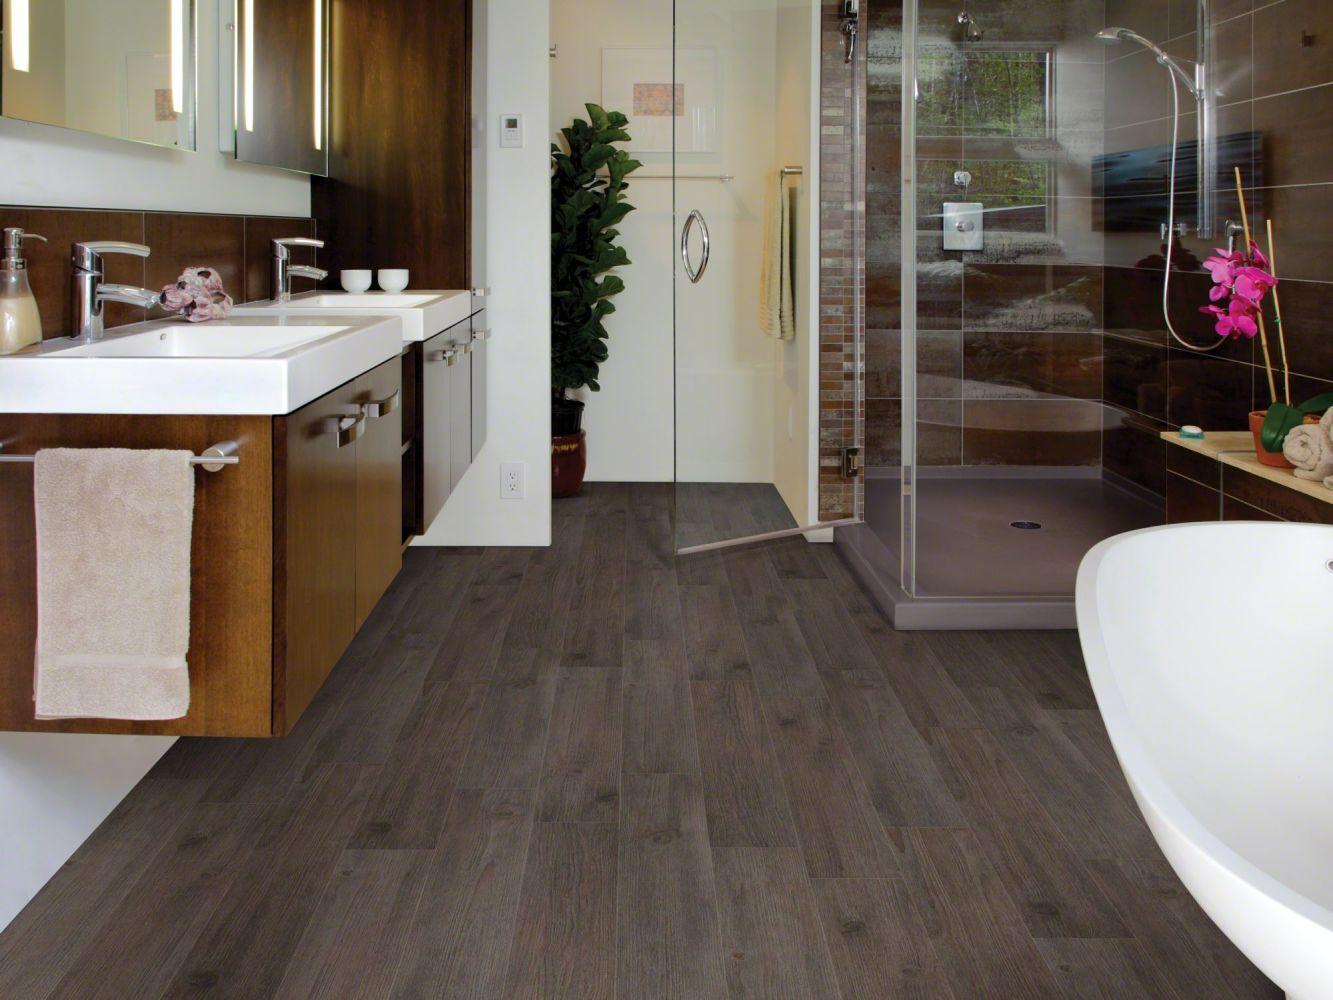 Shaw Floors Resilient Residential Urbanality 20 P Skyline 00759_0330V